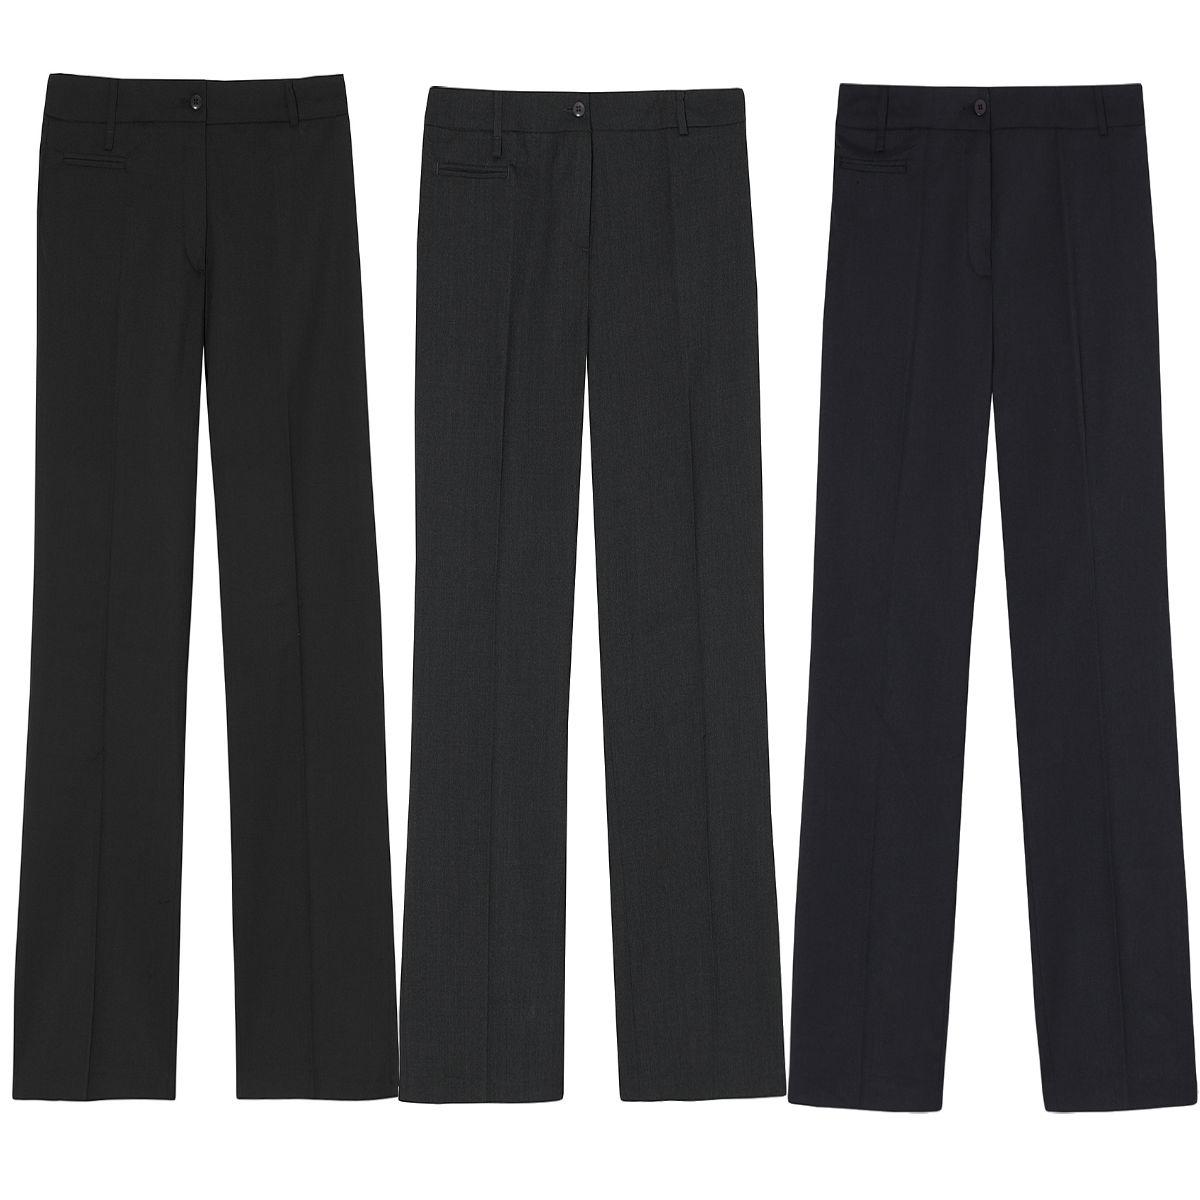 ladies womens work trousers office formal straight leg. Black Bedroom Furniture Sets. Home Design Ideas